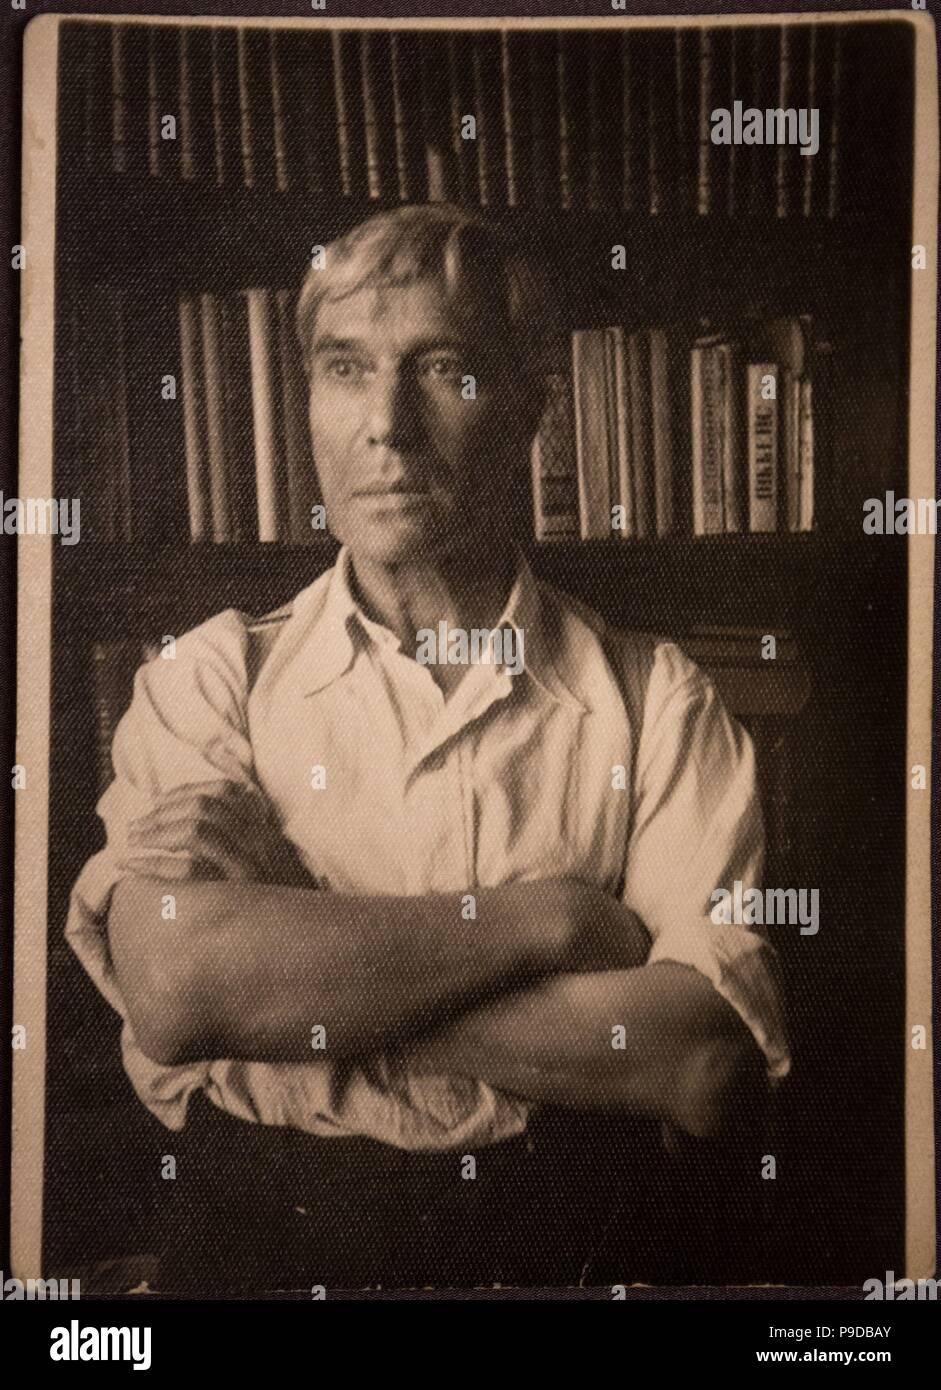 Portrait Of The Poet And Writer Boris Pasternak 1890 1960